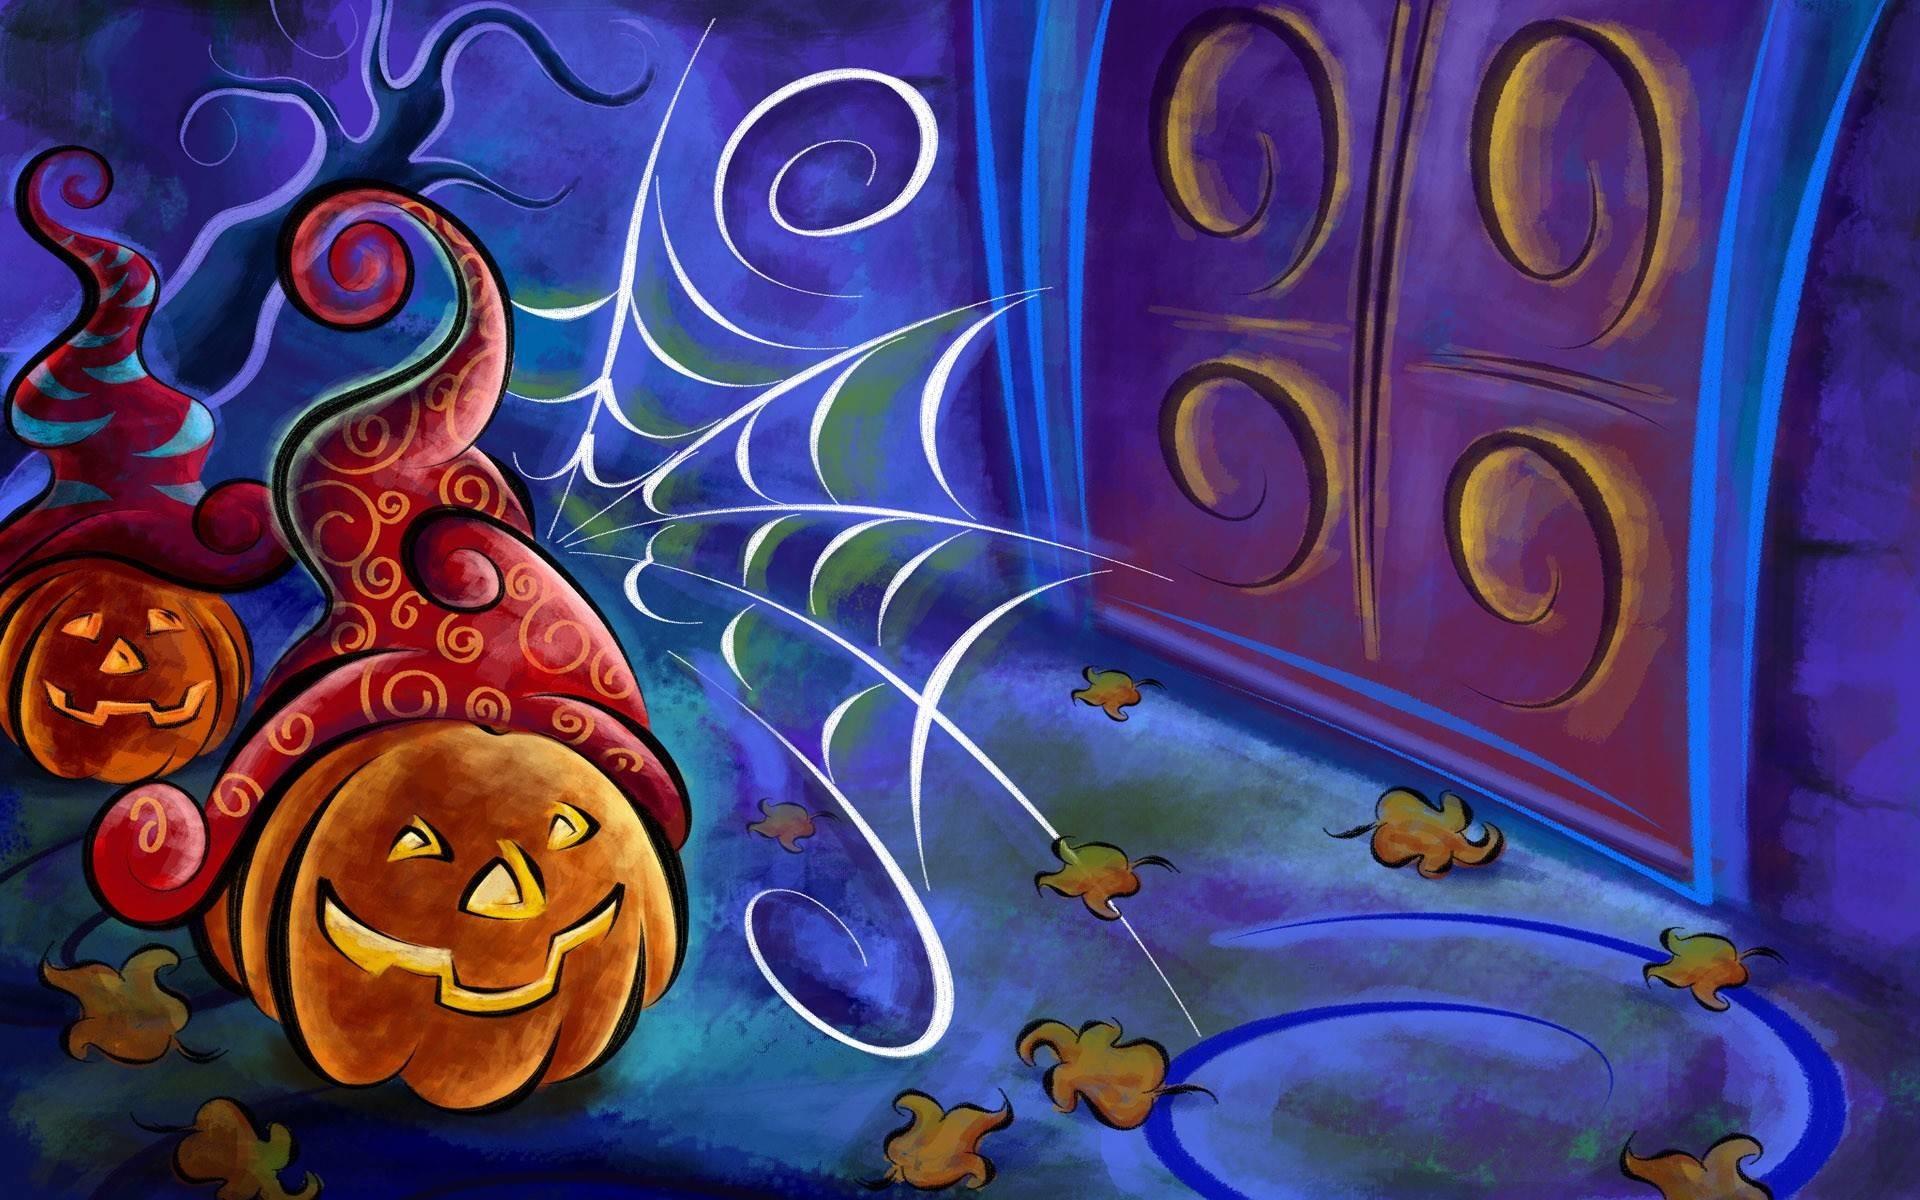 Halloween Wallpapers Screensavers – Wallpaper Cave. Halloween Wallpapers  Screensavers Wallpaper Cave